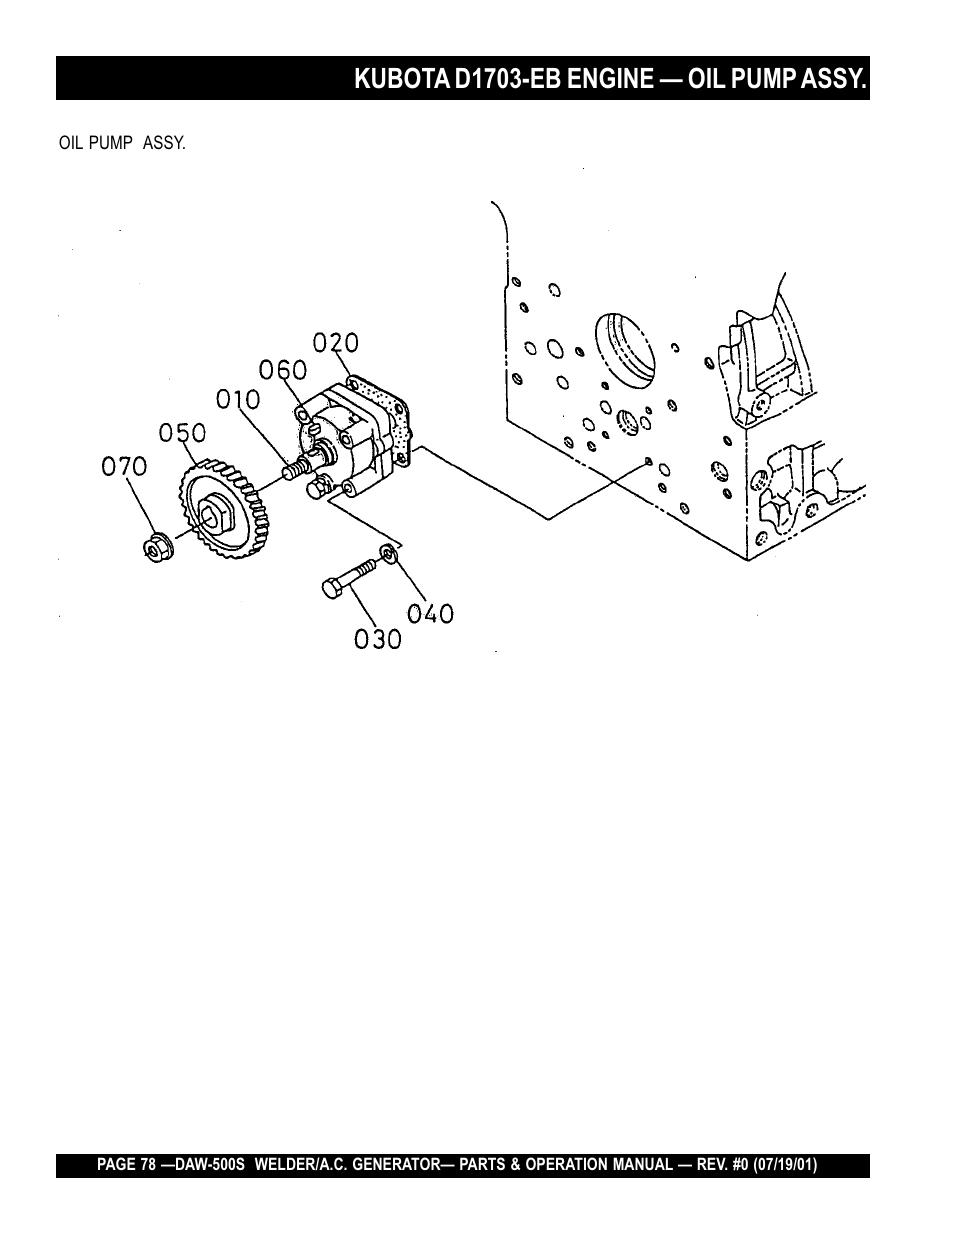 Kubota d1703-eb engine — oil pump assy | Multiquip DAW500S User Manual |  Page 78 / 142